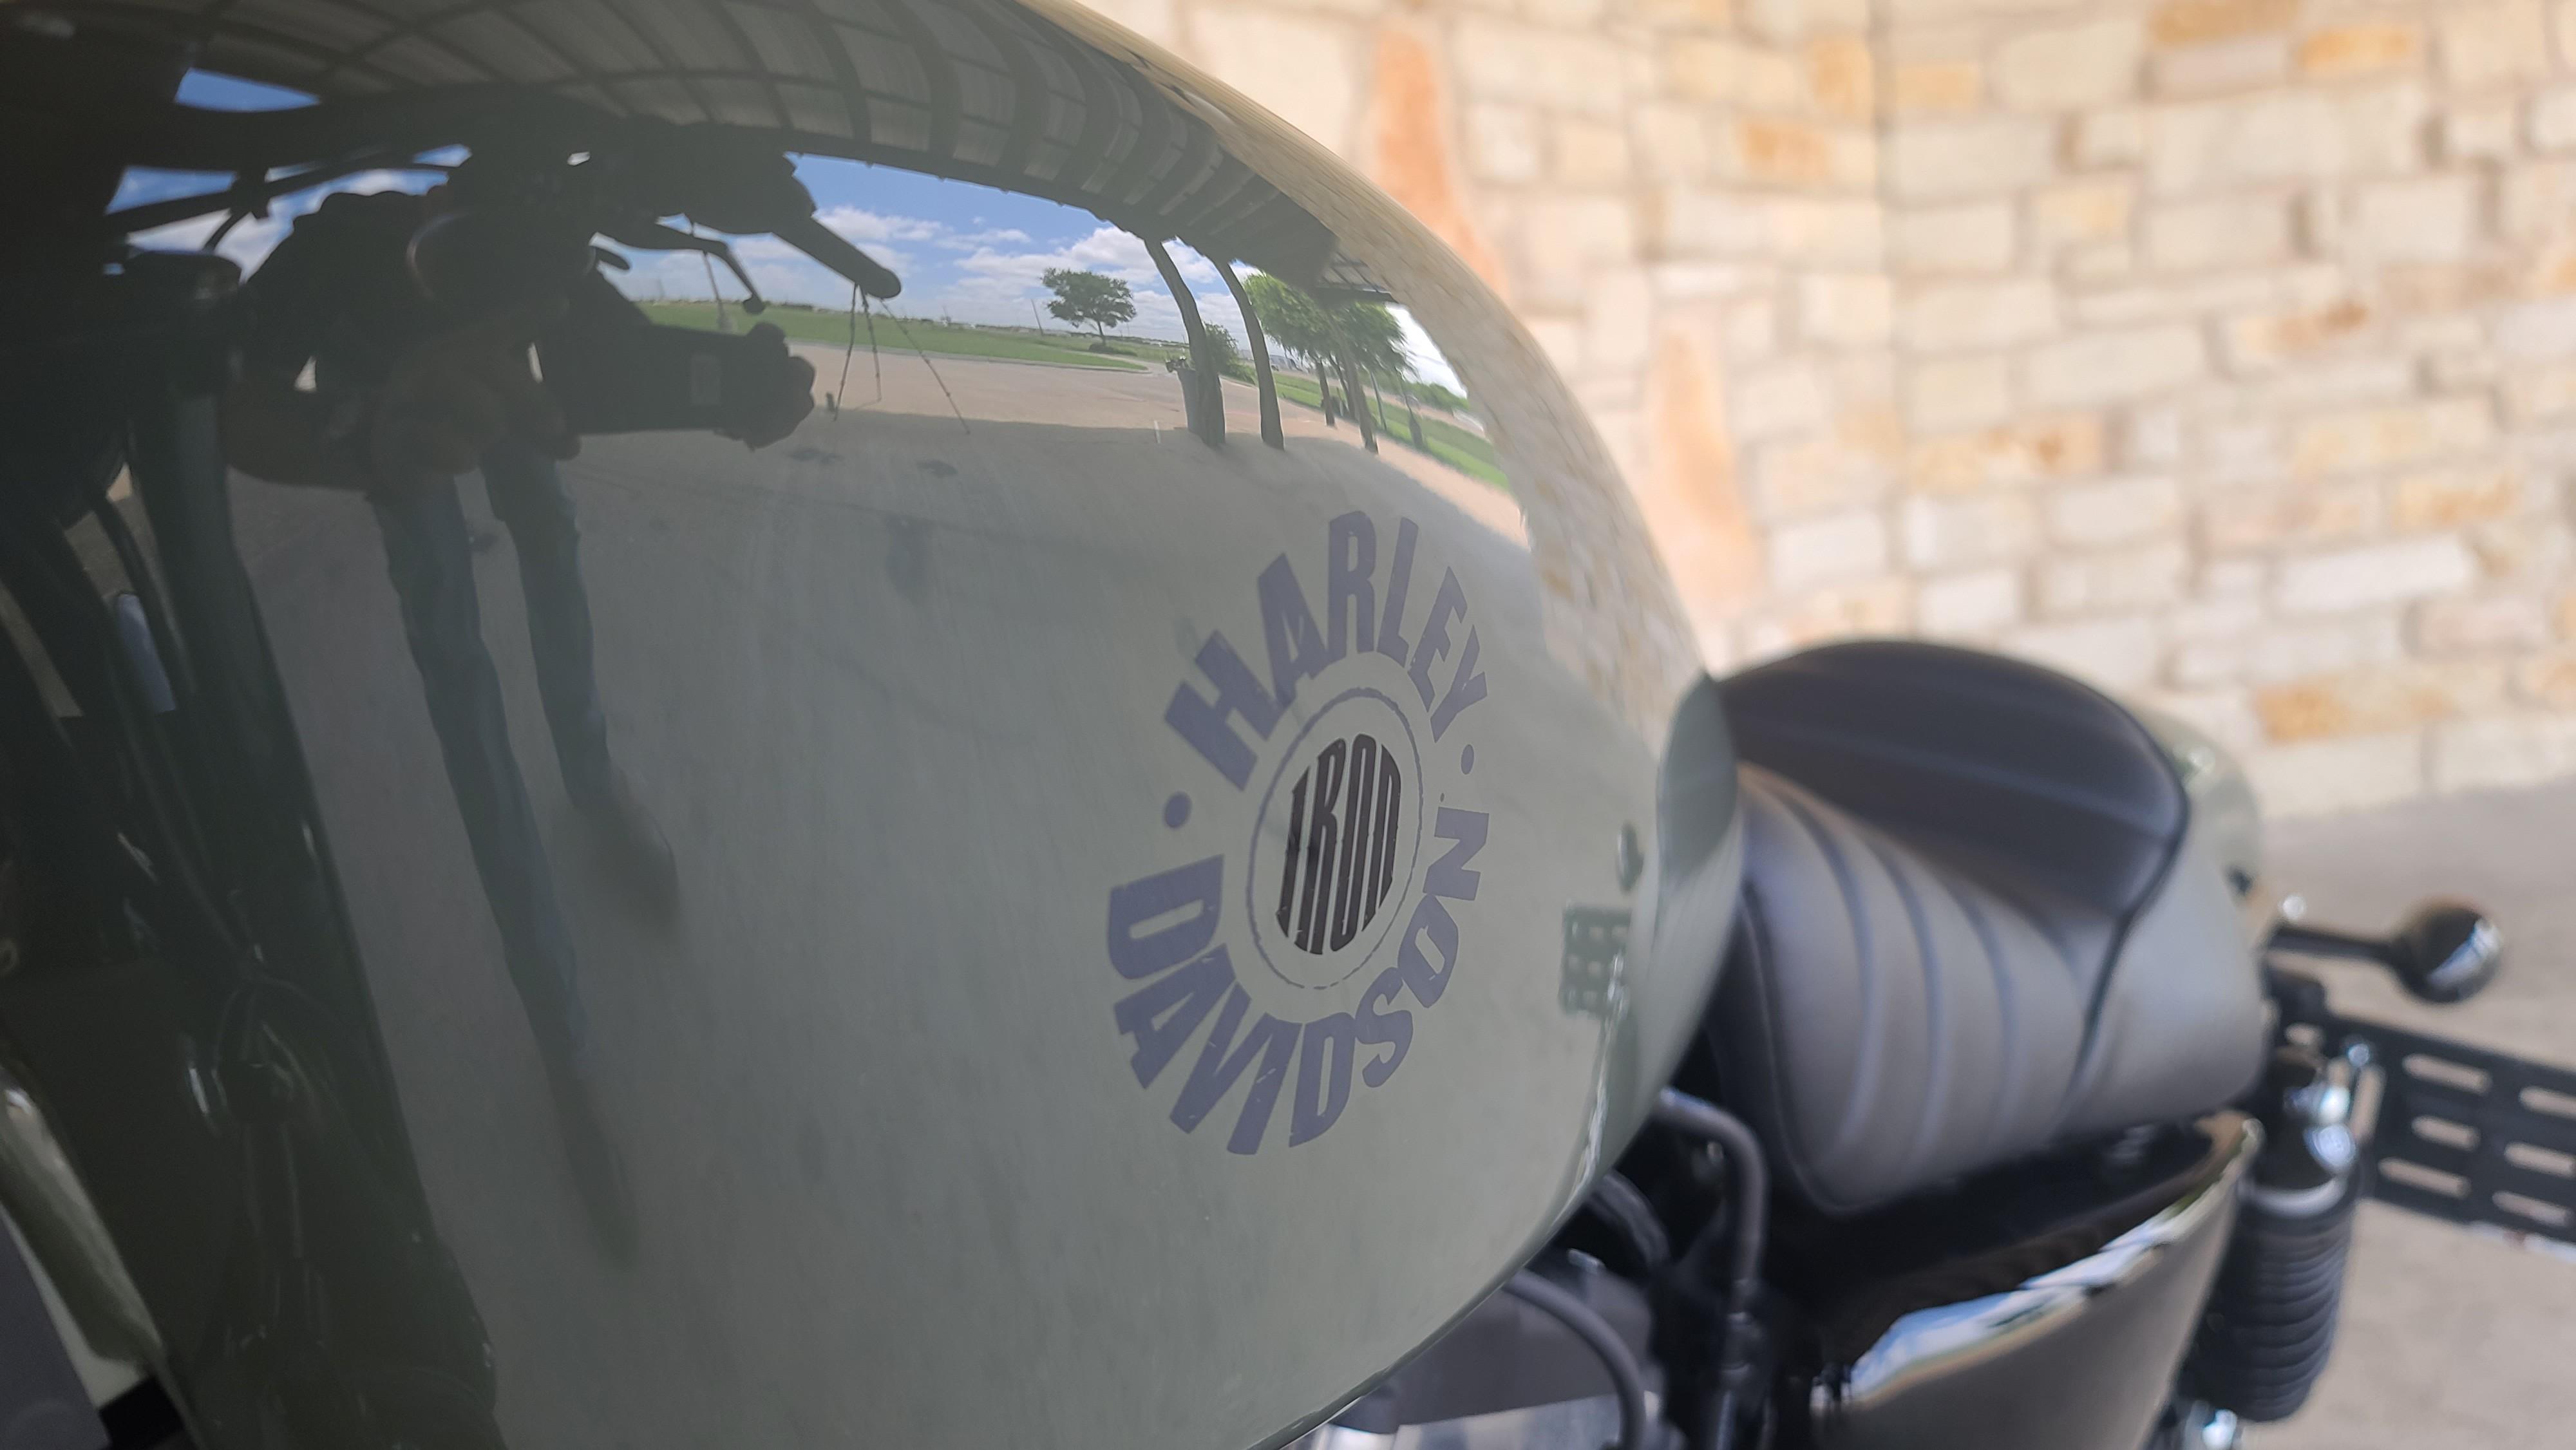 2021 Harley-Davidson IRON 883 XL 883N Iron 883 at Harley-Davidson of Waco